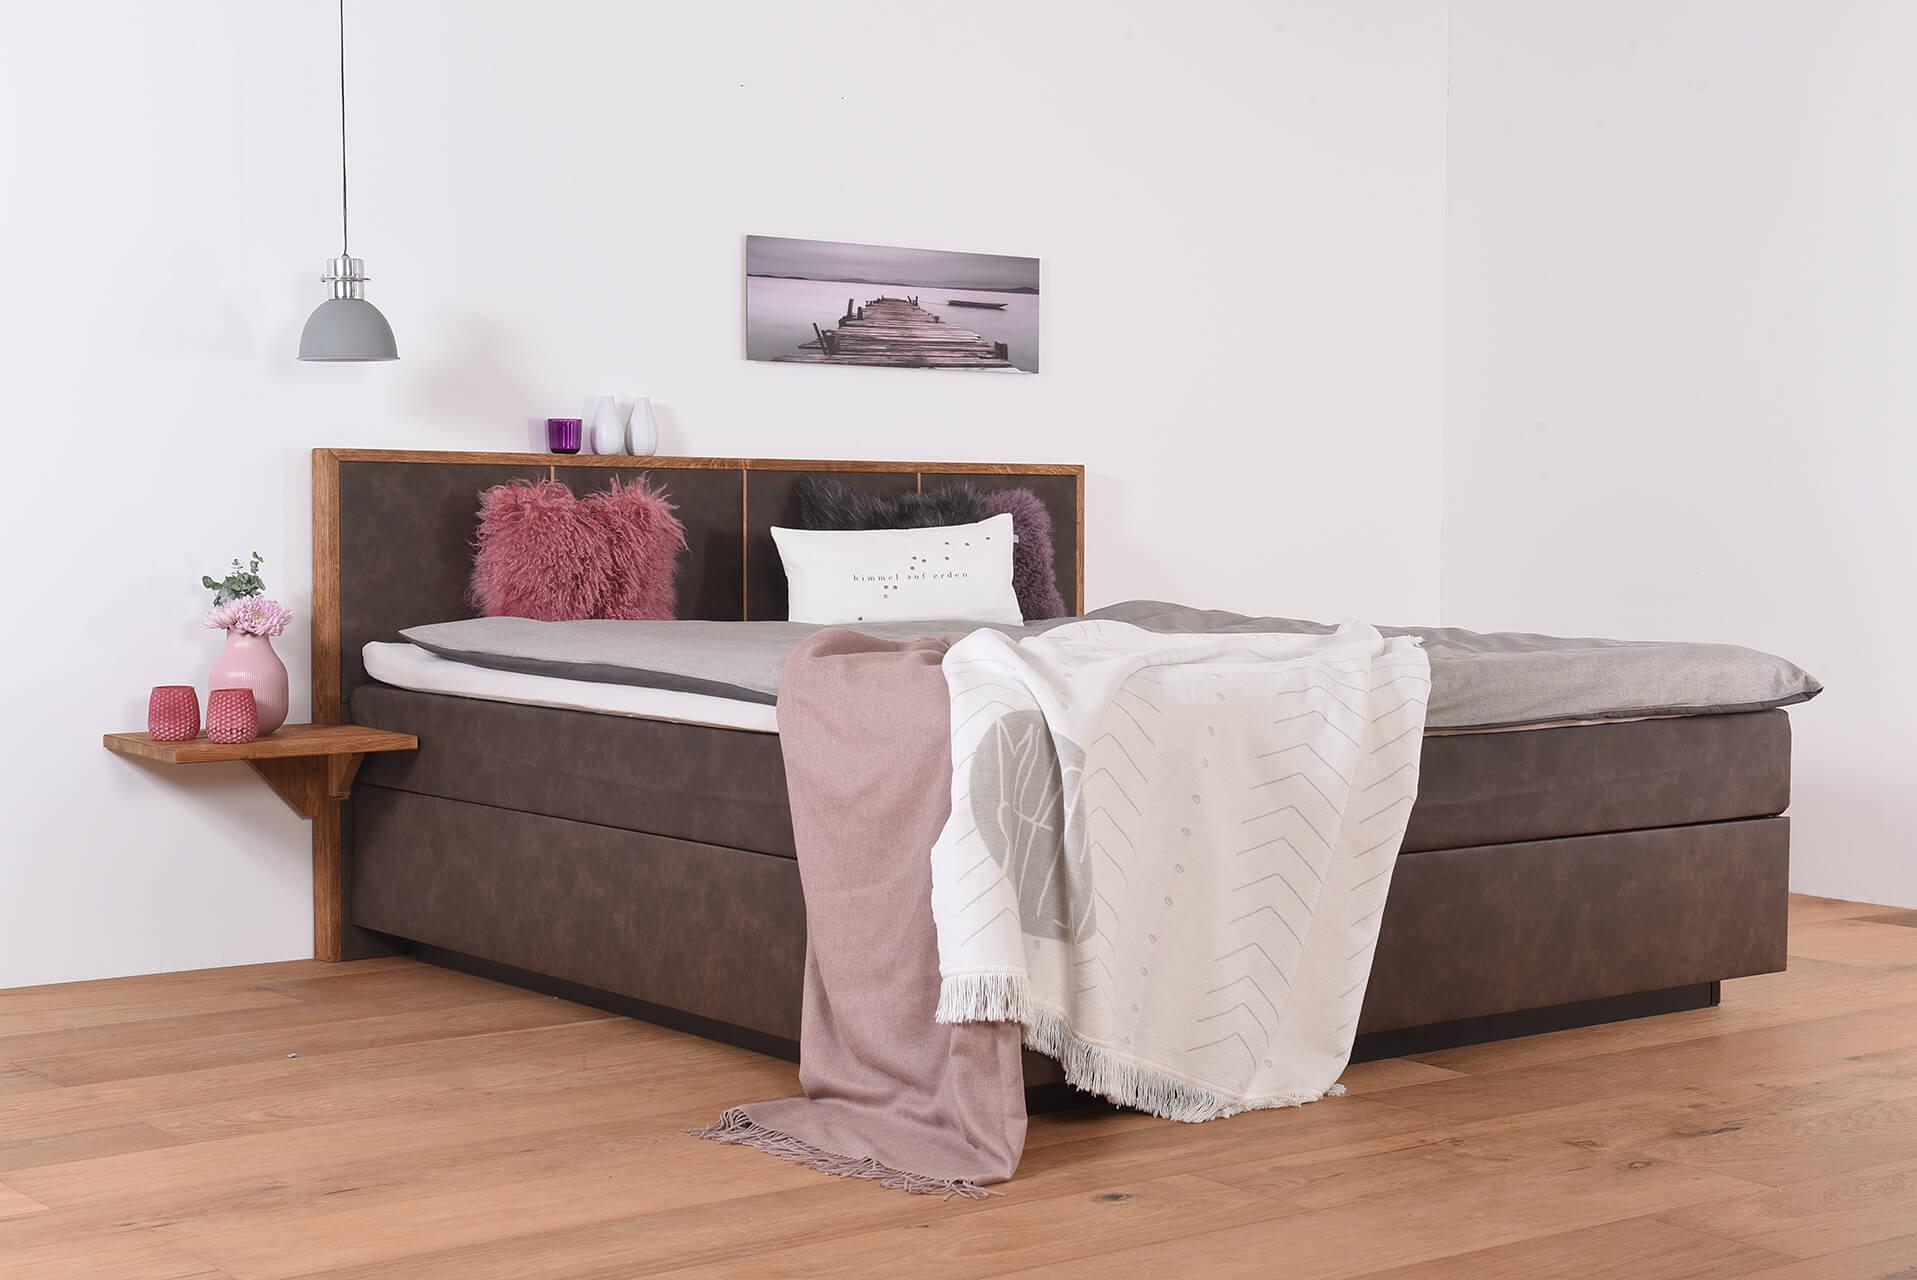 wasserbett in boxspringoptik wandpaneel quaddro topper nachttischablage laken suma. Black Bedroom Furniture Sets. Home Design Ideas